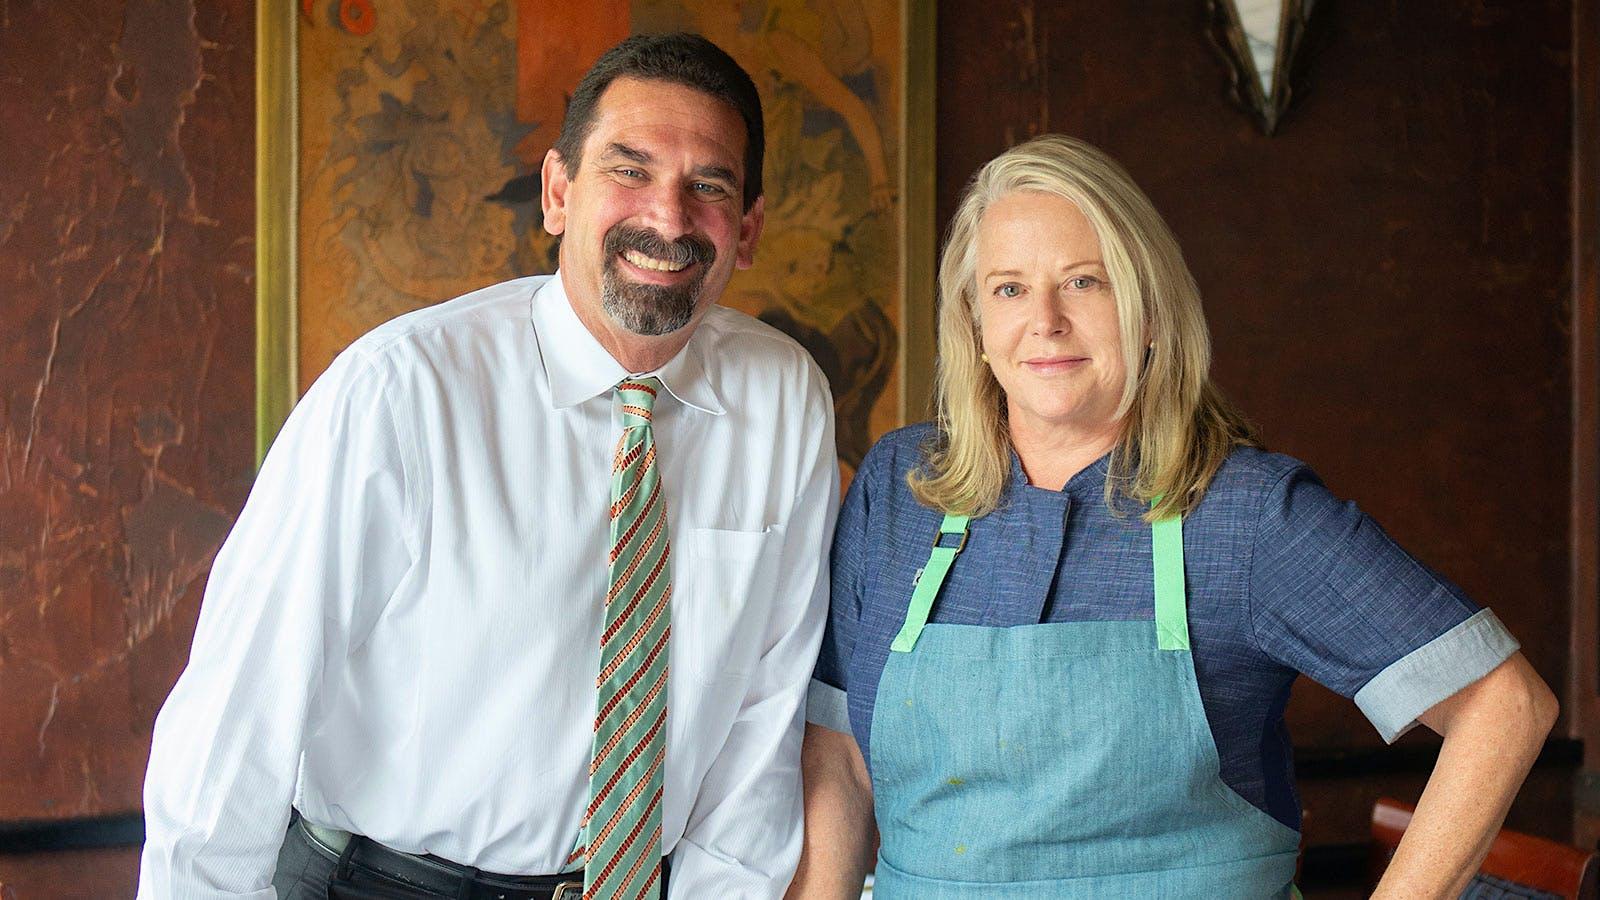 Restaurant Talk: The Dynamic Duo Behind a San Francisco Classic